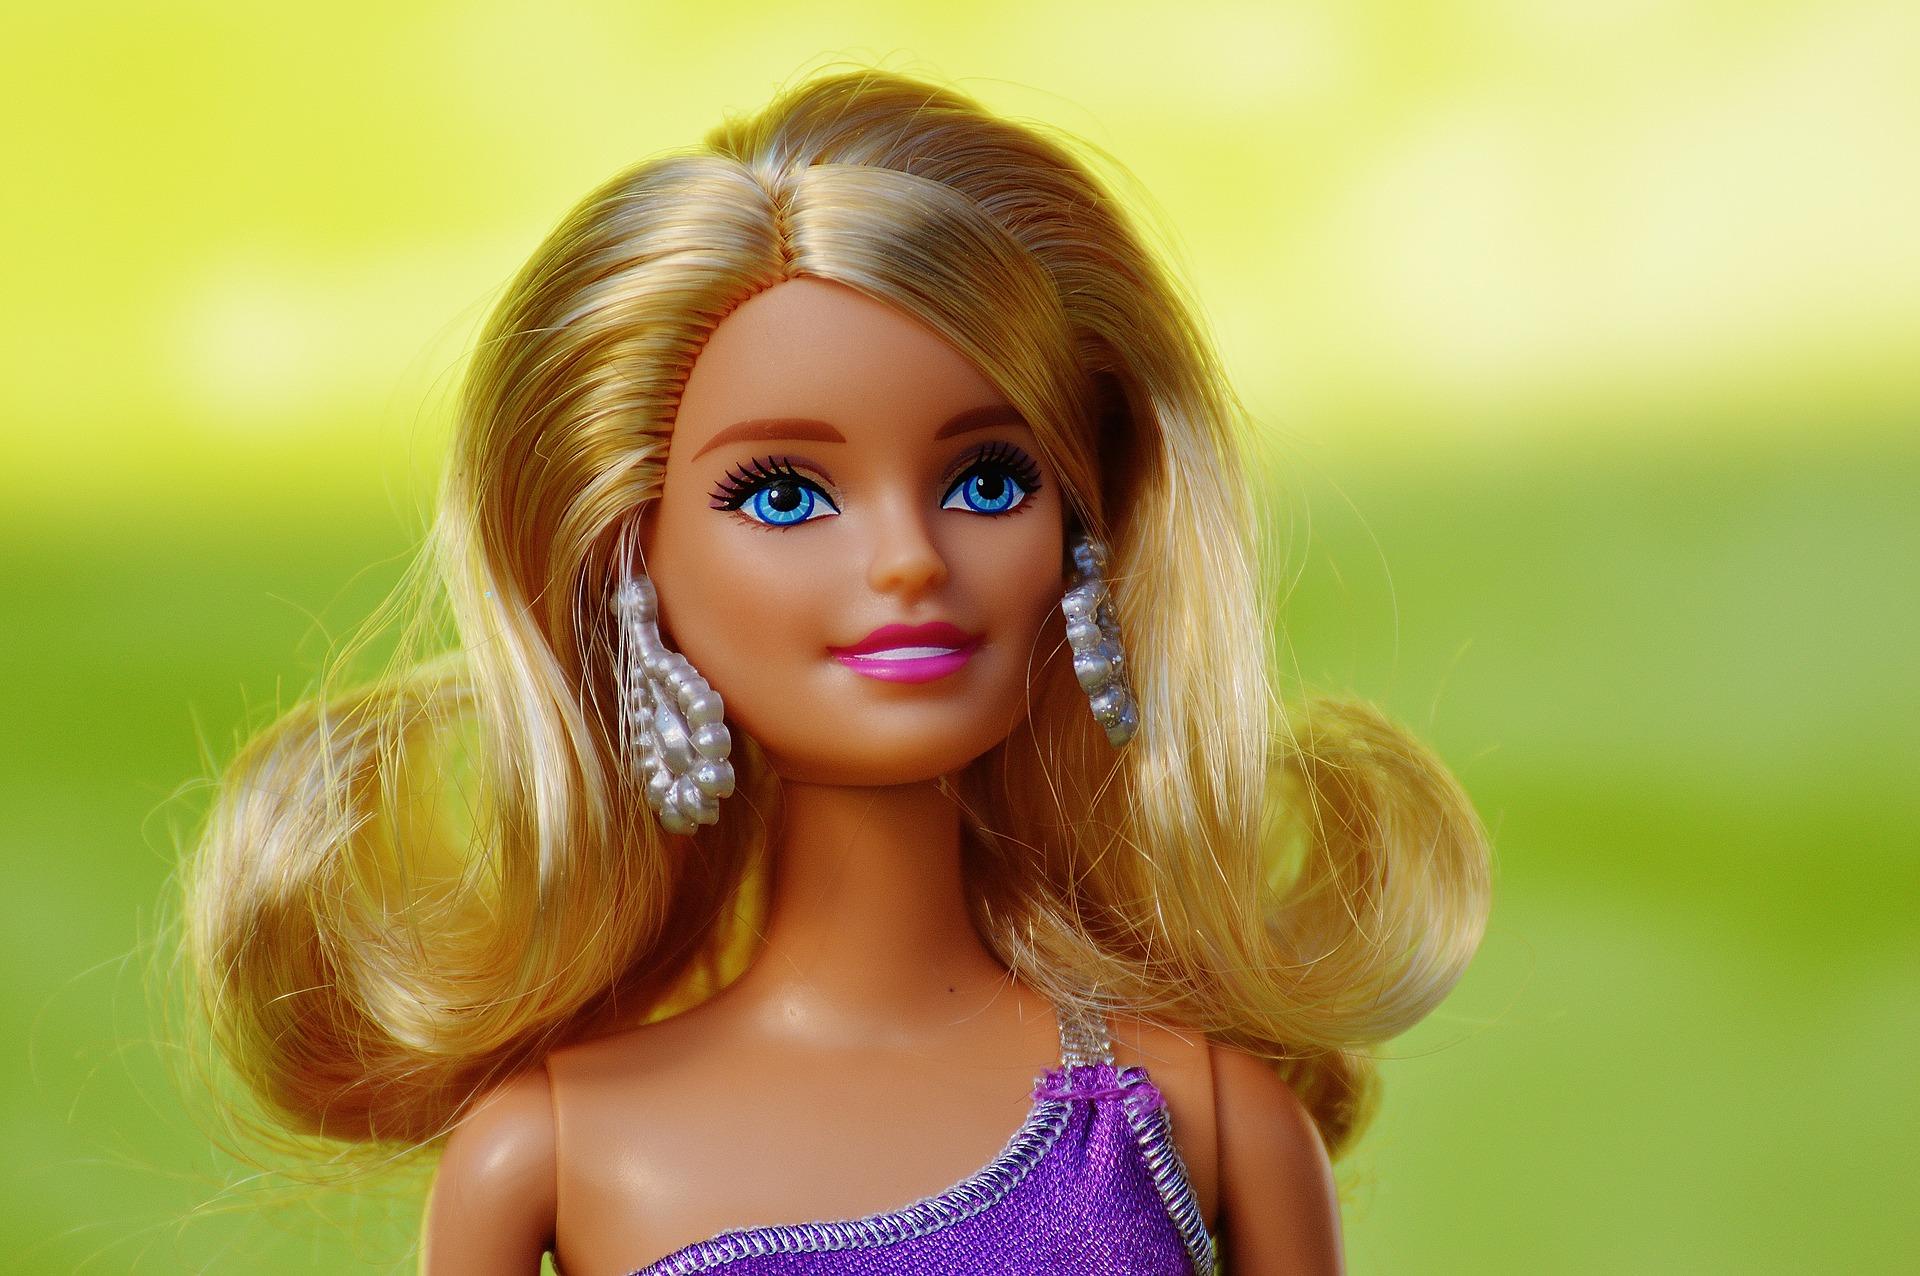 mujeres en lucha, feminismo, barbie, netflix, juguetes, regalos, género